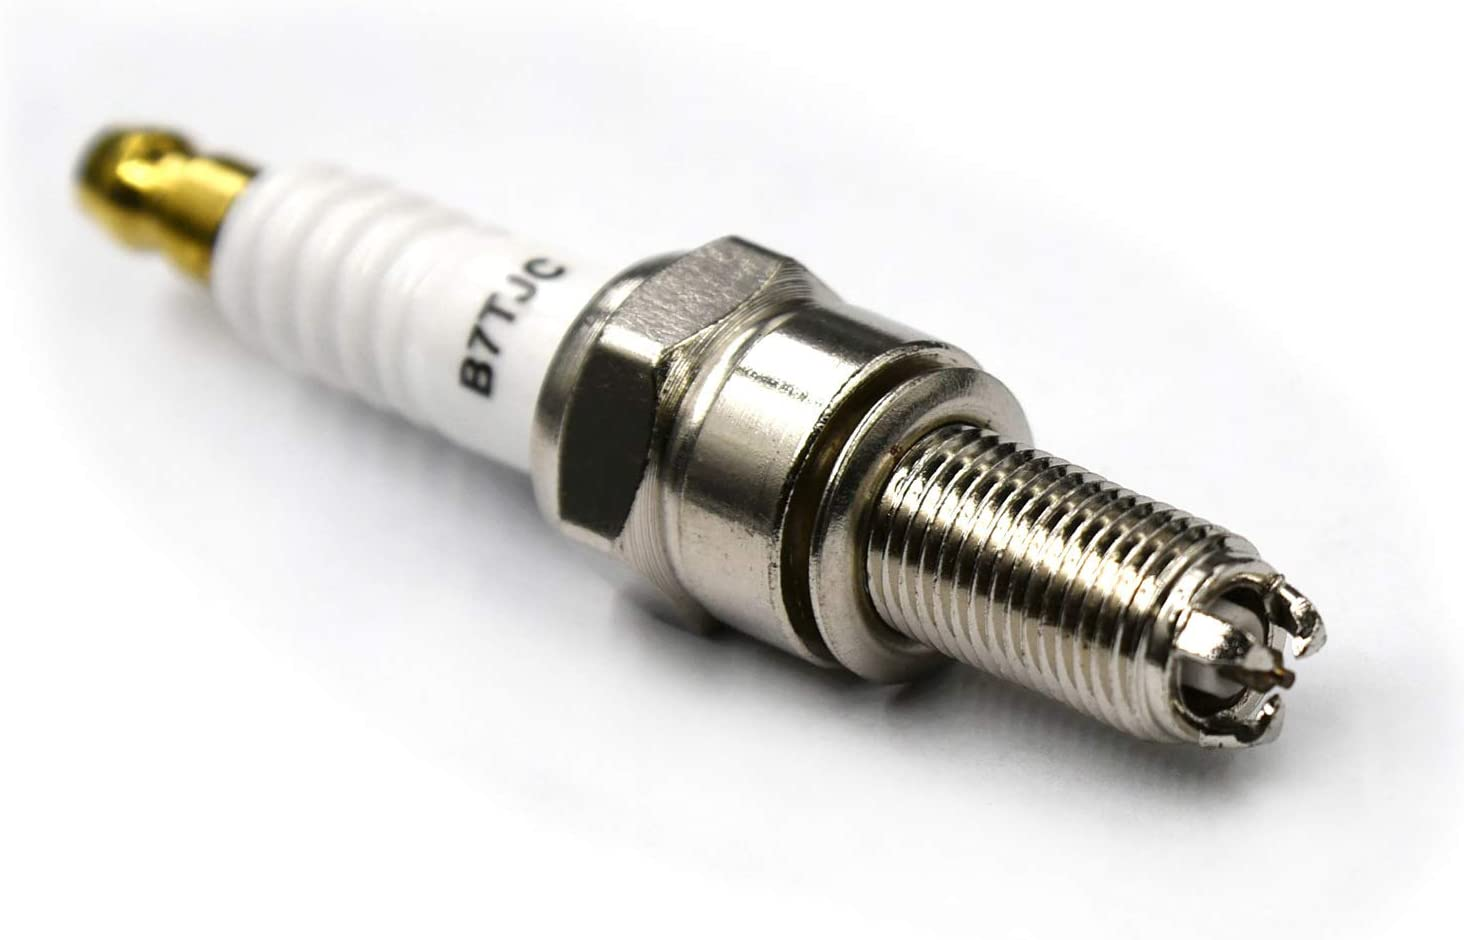 white, pack of 1 YUNTAO Spark-Plug B7TC for Suzuki CR7E CR7EIX CPR7EA-9 CPR8EA-9 CPR8EAIX-9 96067 CR8E CR8EIX IU24 IU22 UR4DC UR6DE PRG6HCC